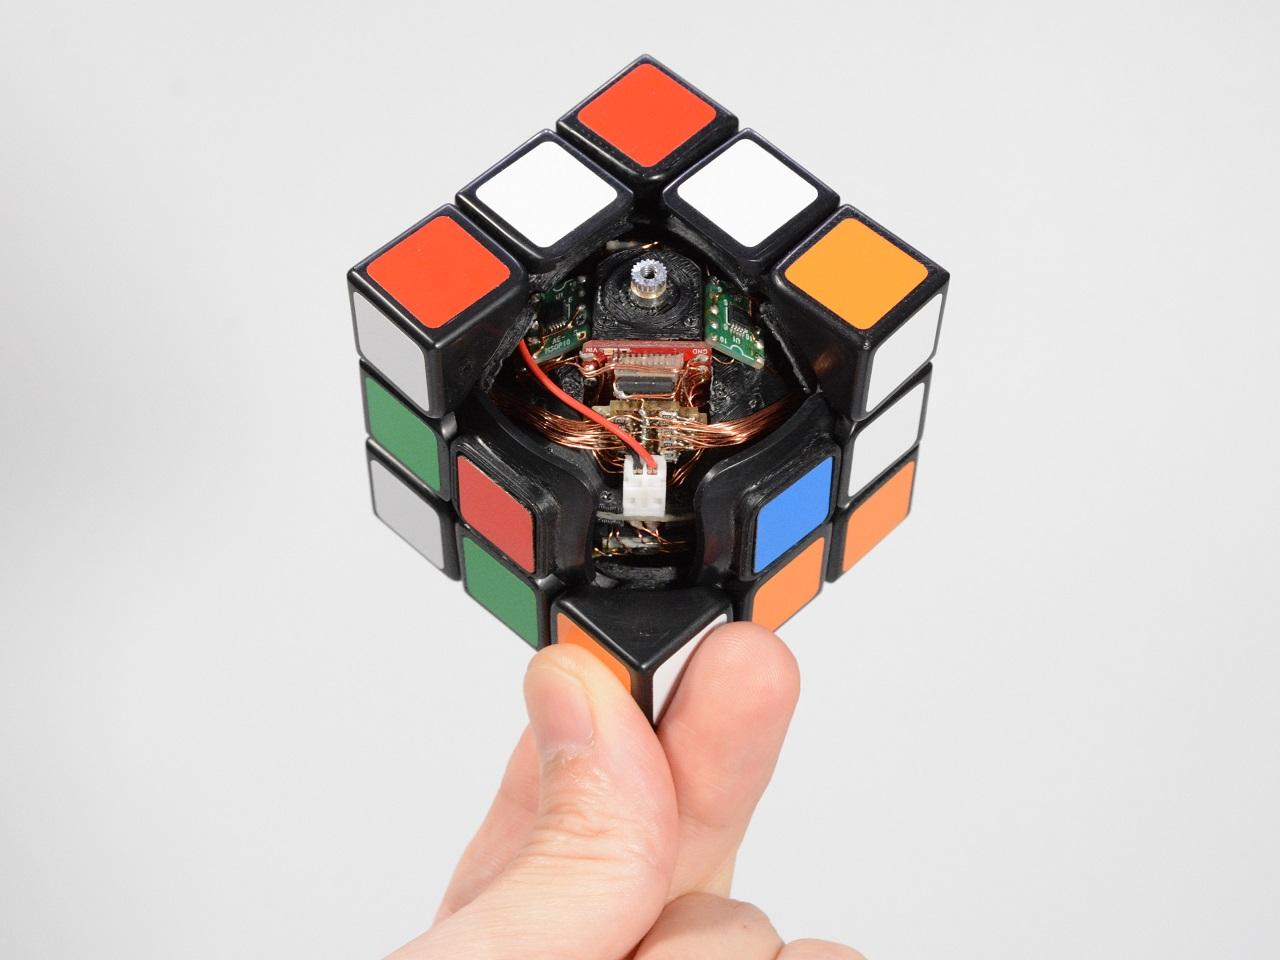 Ein schwebender selbstlösender Zauberwürfel | Floating Self-Solving Rubik's Cube